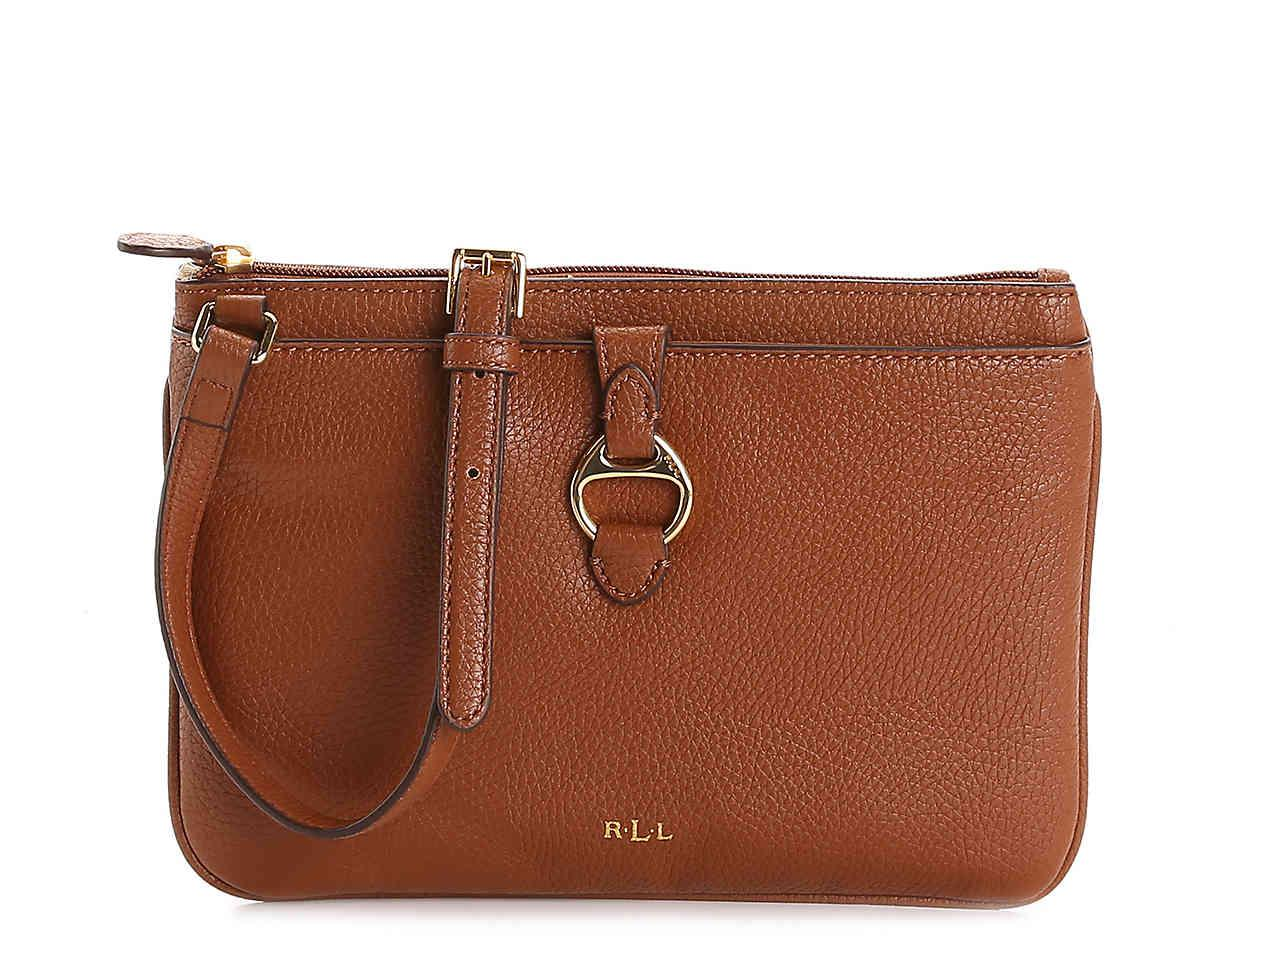 9e9b0b1d39 Lyst - Lauren by Ralph Lauren Anfield Ii Crossbody Bag in Brown